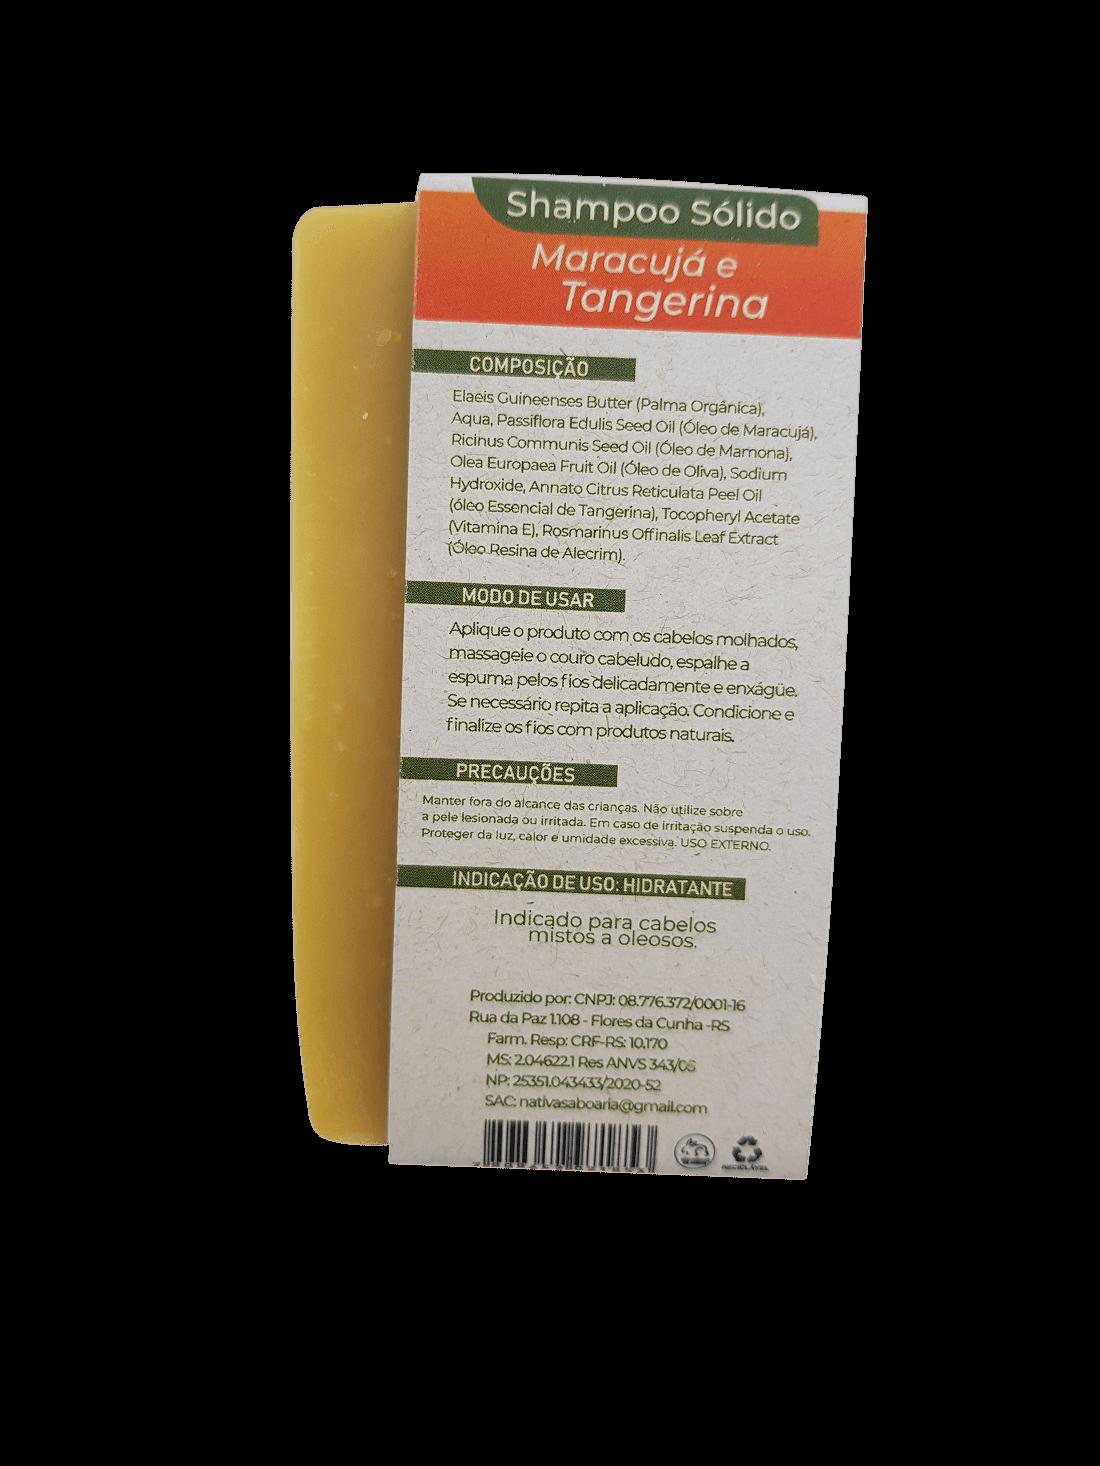 Shampoo Sólido - Maracujá e Tangerina  - Saboaria Nativa Ecocosméticos